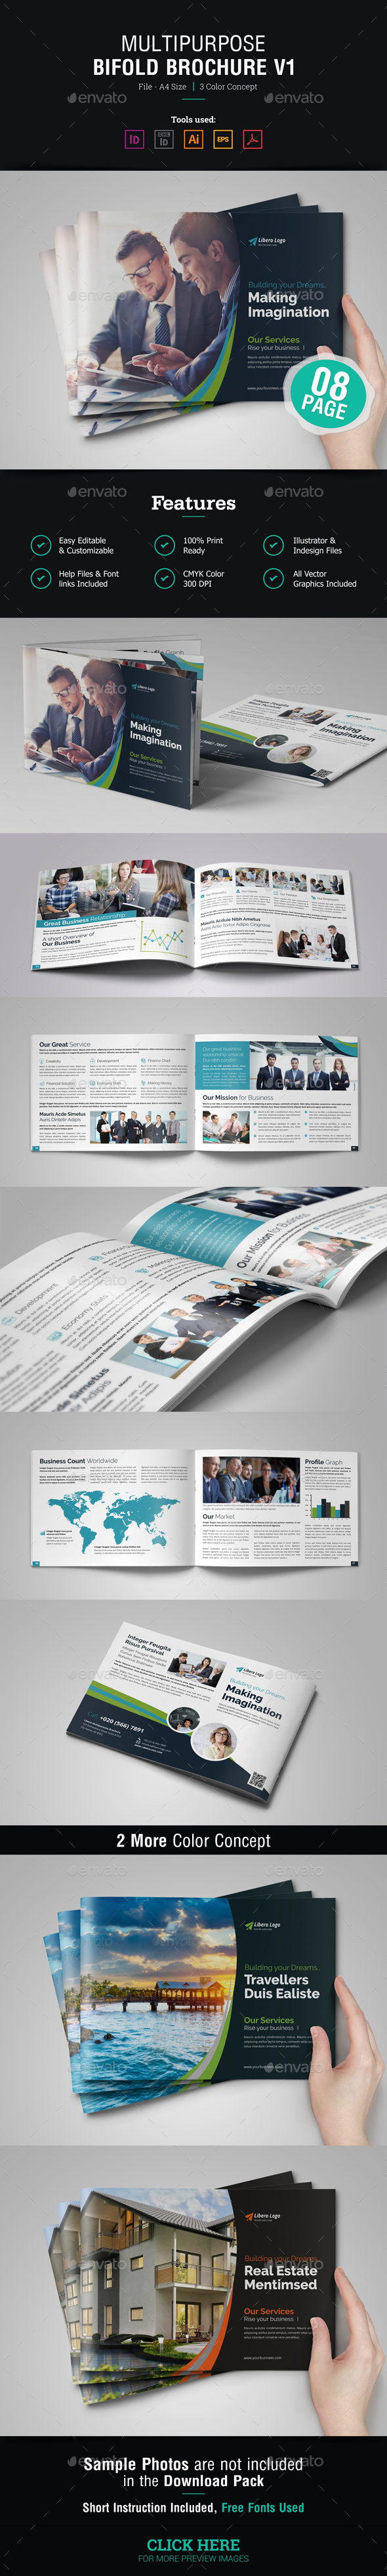 Multipurpose Bifold Brochure v1 - Corporate Brochures